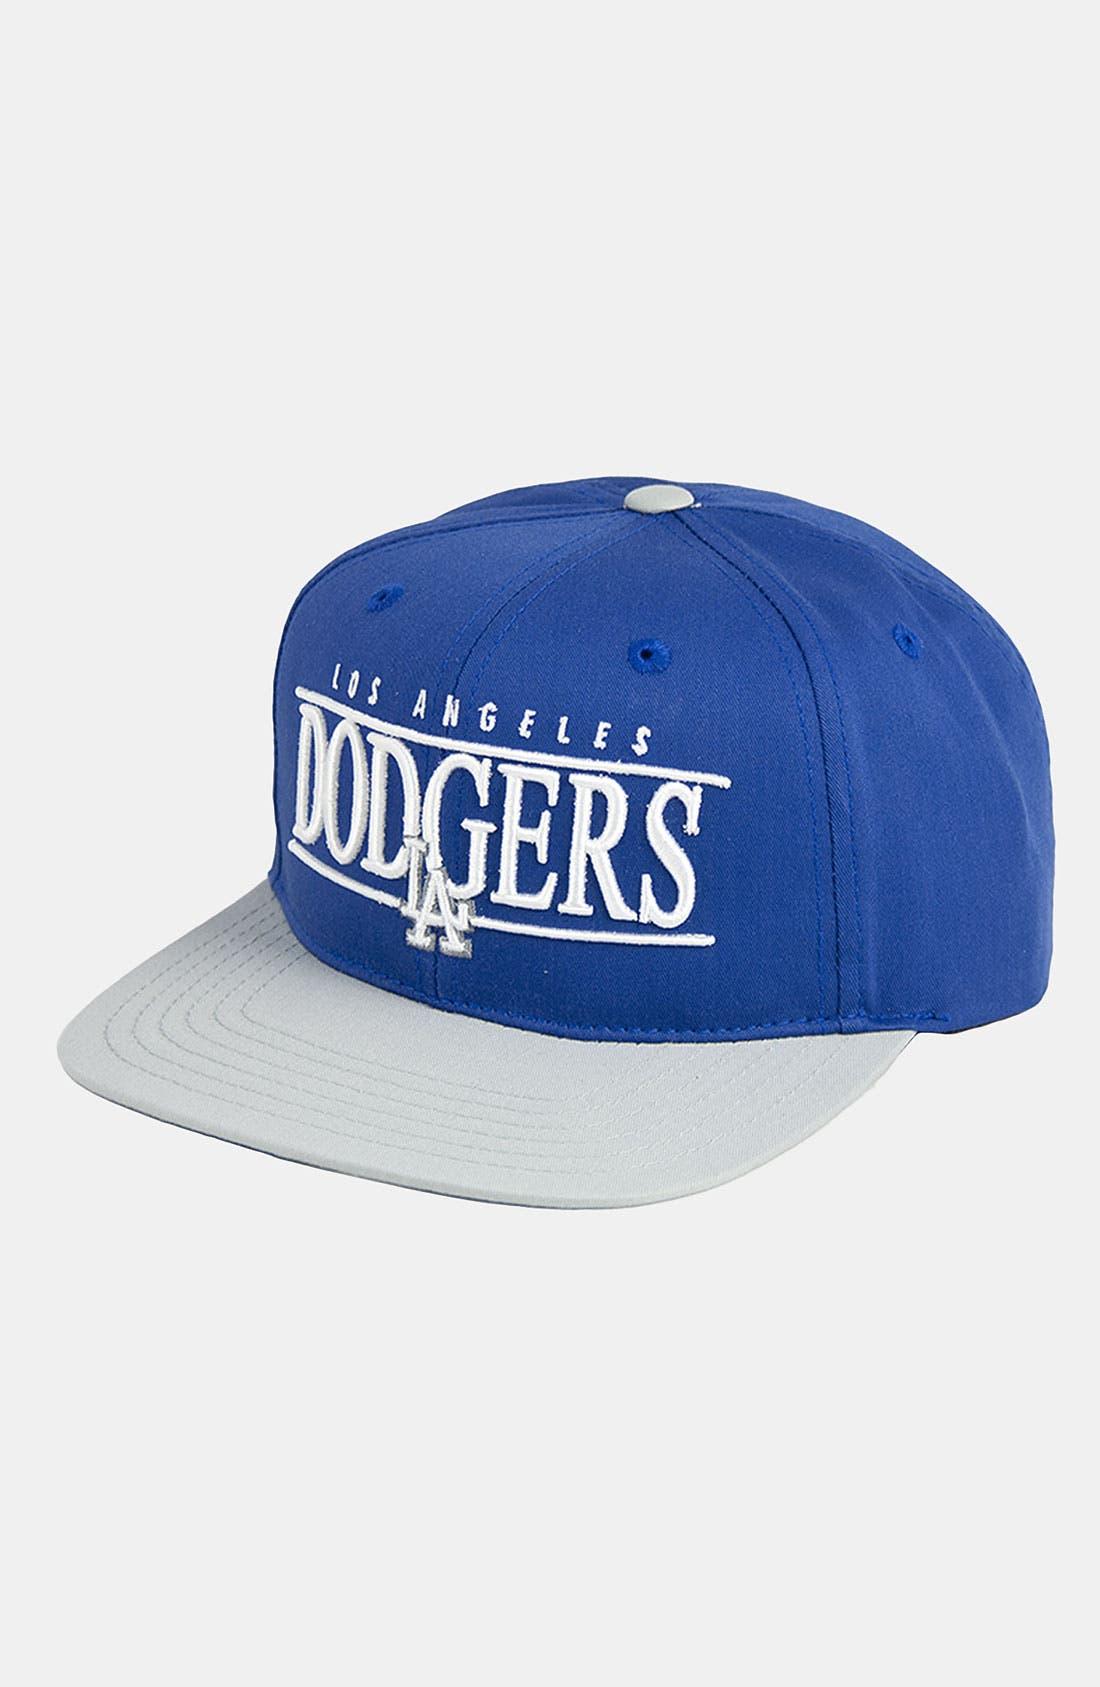 Alternate Image 1 Selected - American Needle 'Los Angeles Dodgers - Nineties' Twill Snapback Baseball Cap